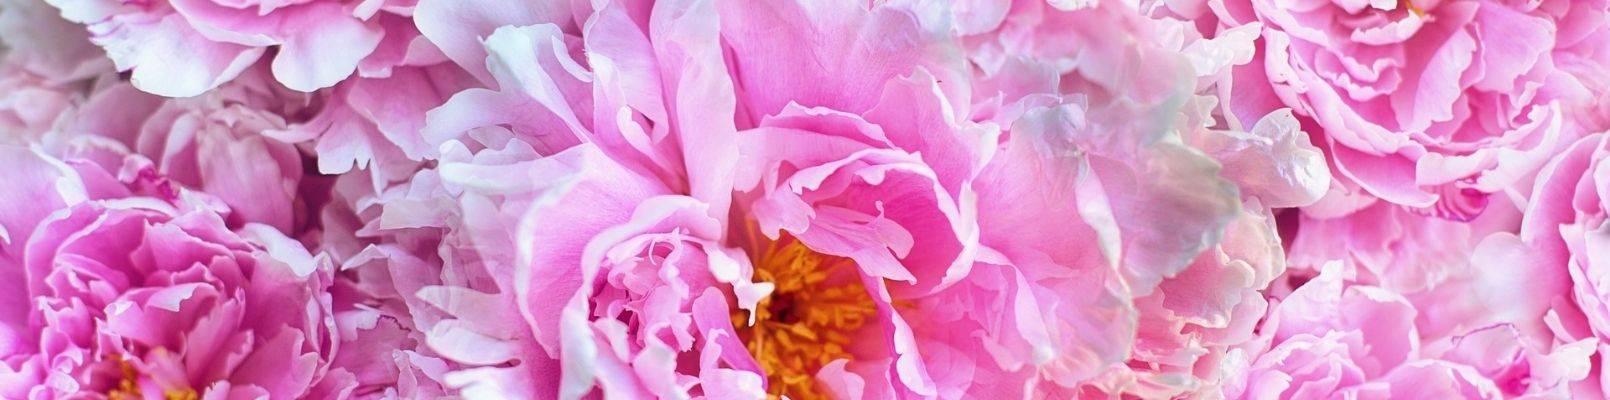 horoscop floral bujori